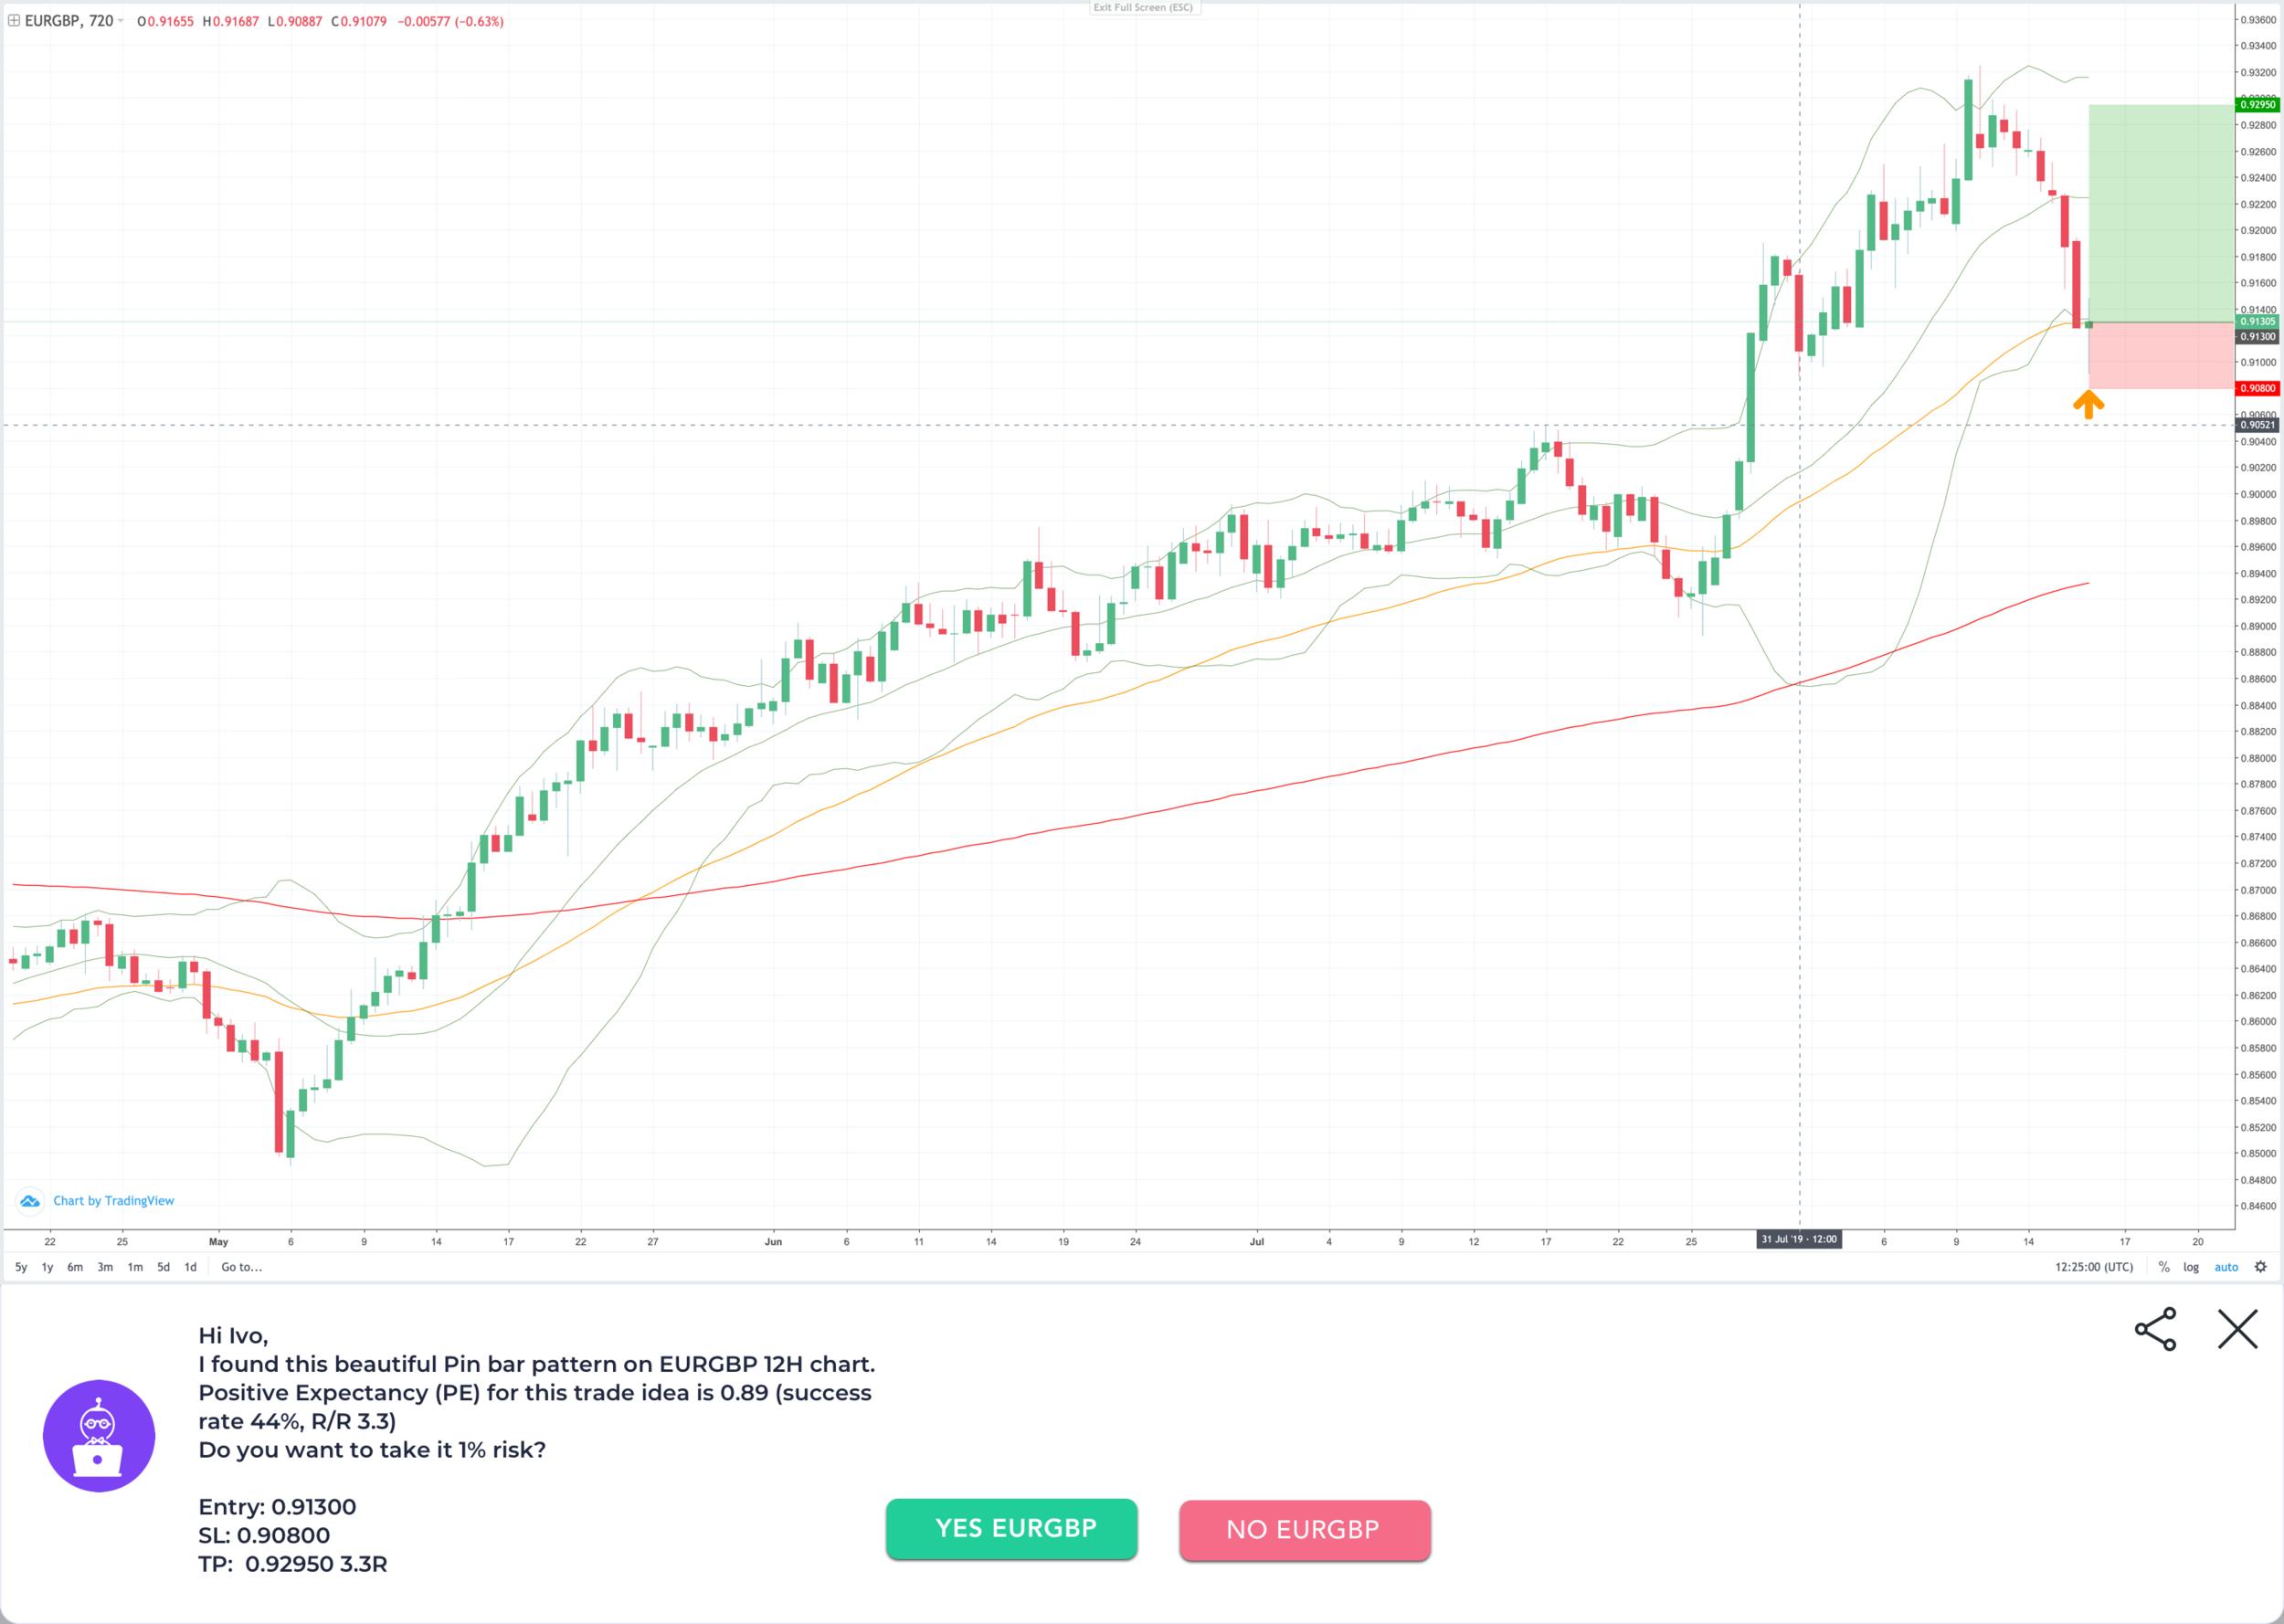 Get transparent trading signals